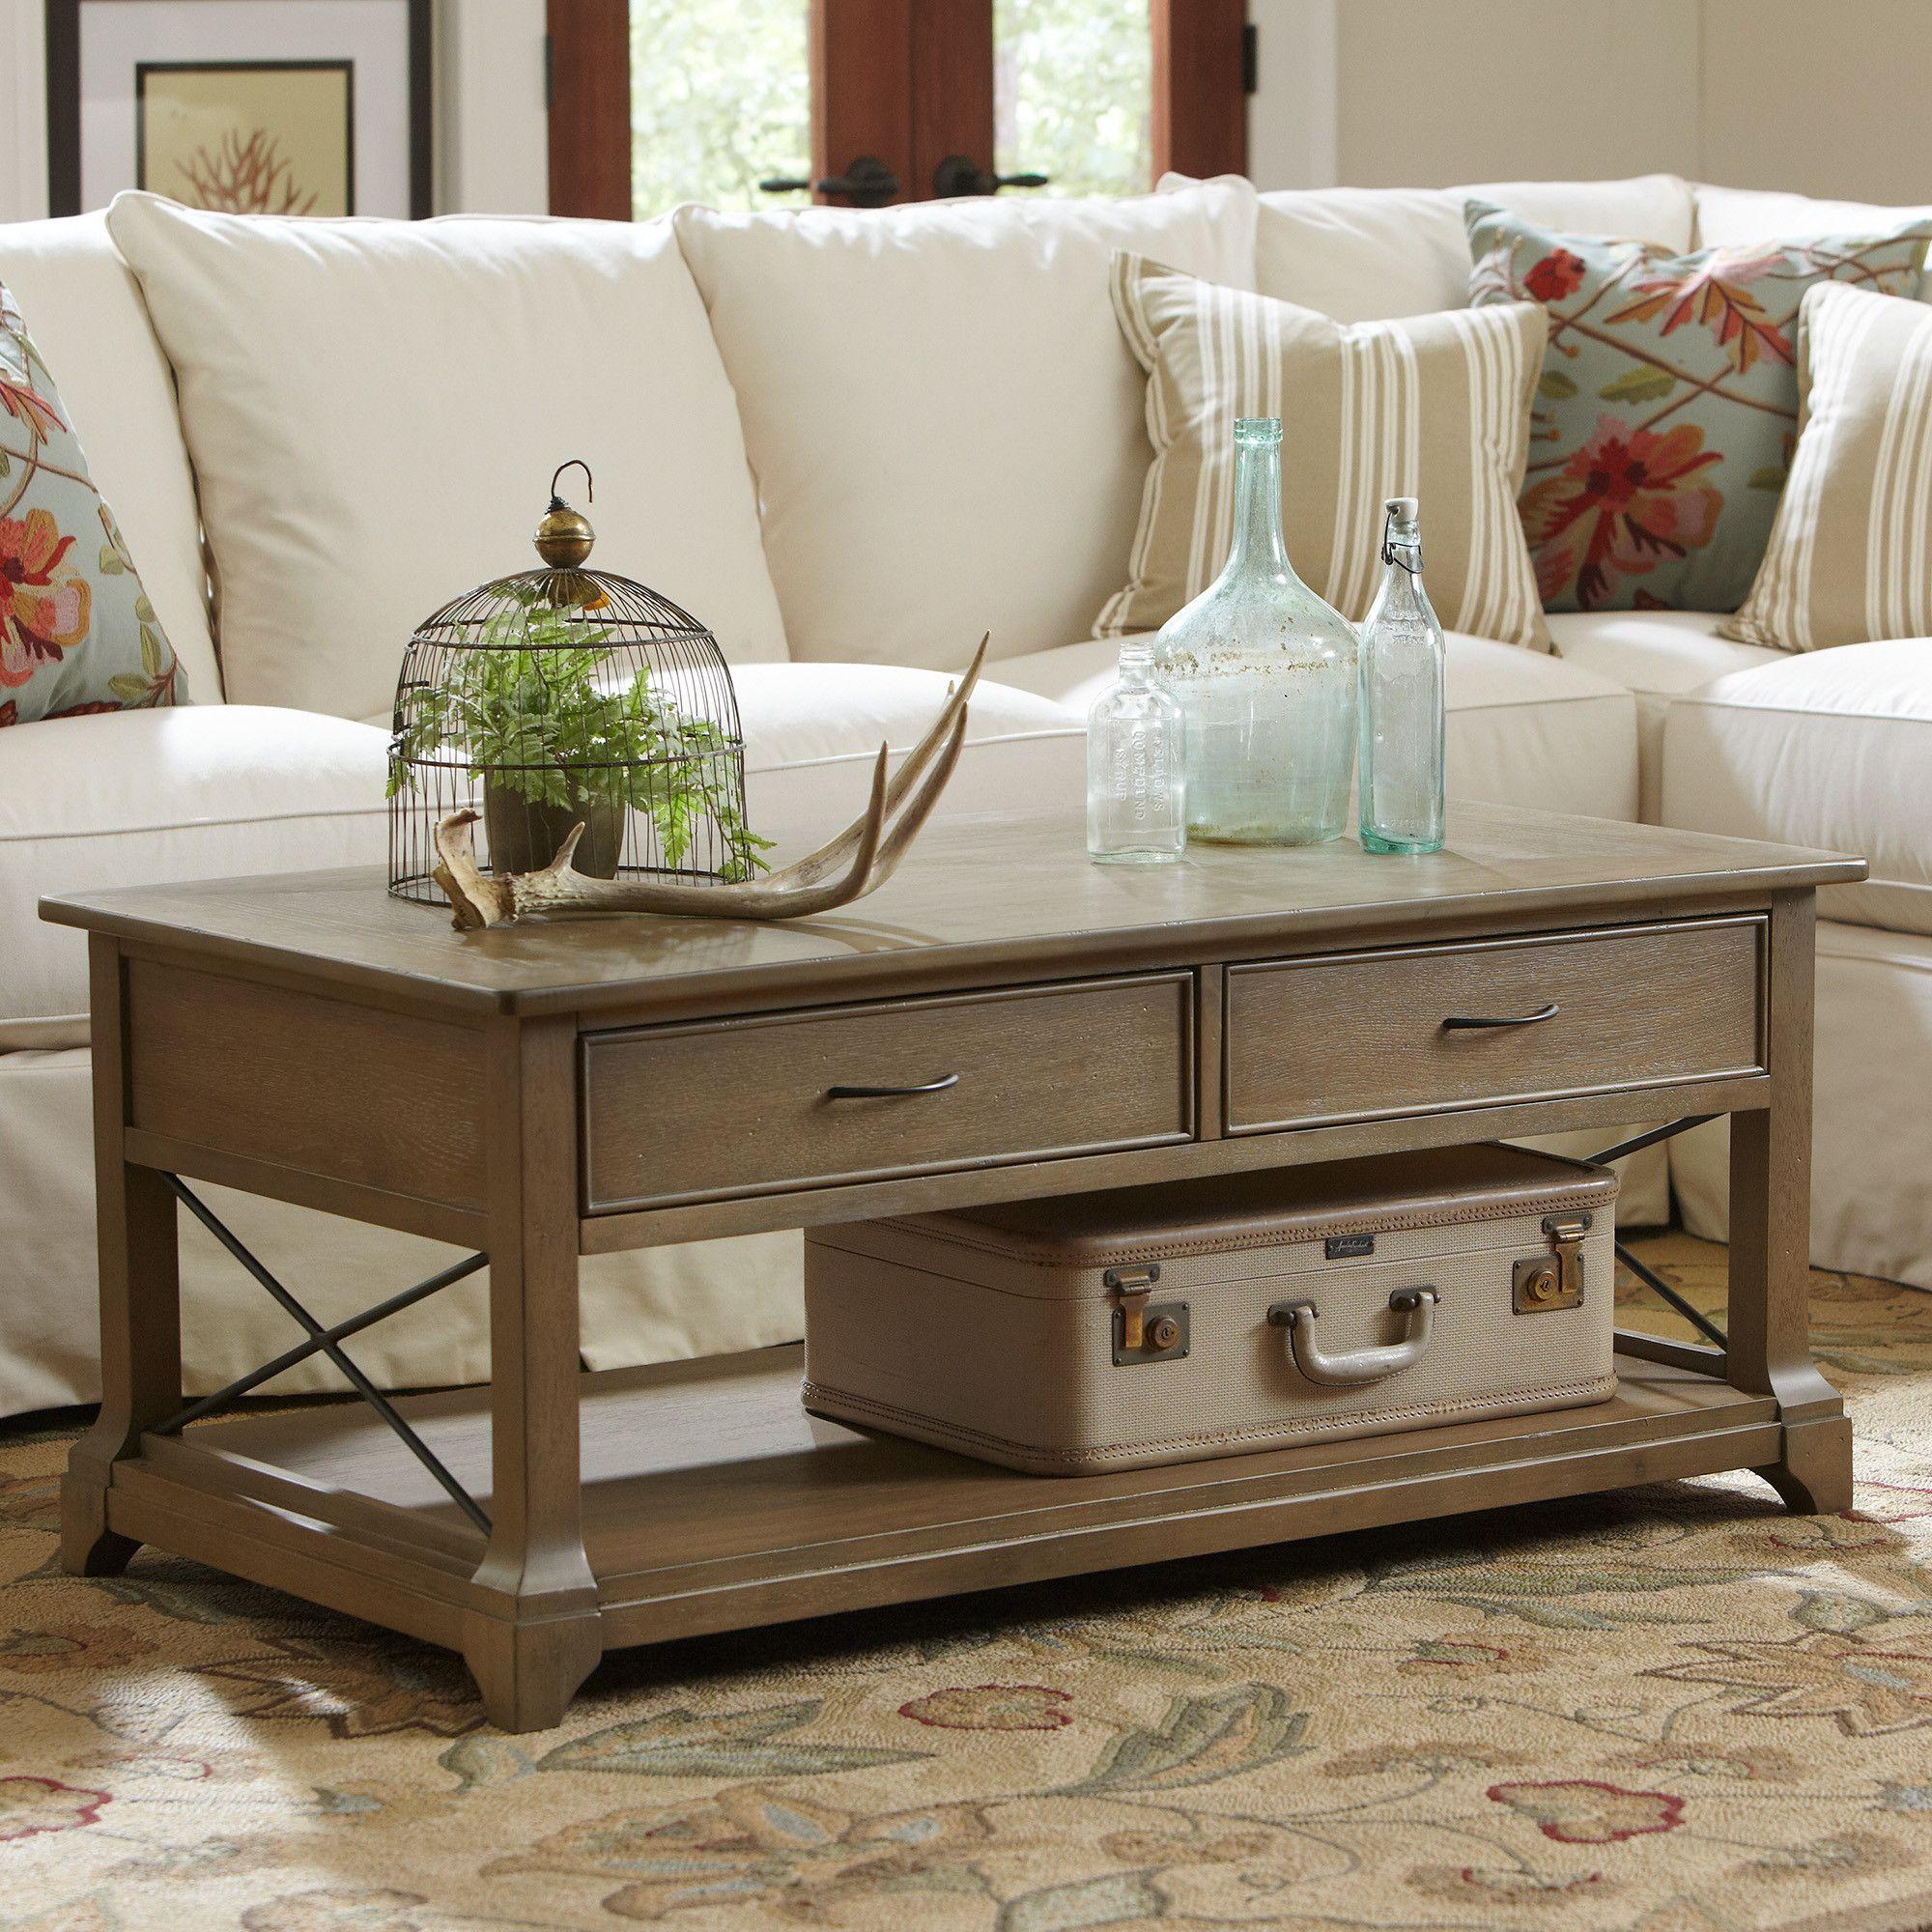 Birch Lane Kenmore Coffee Table Stephanie Fong